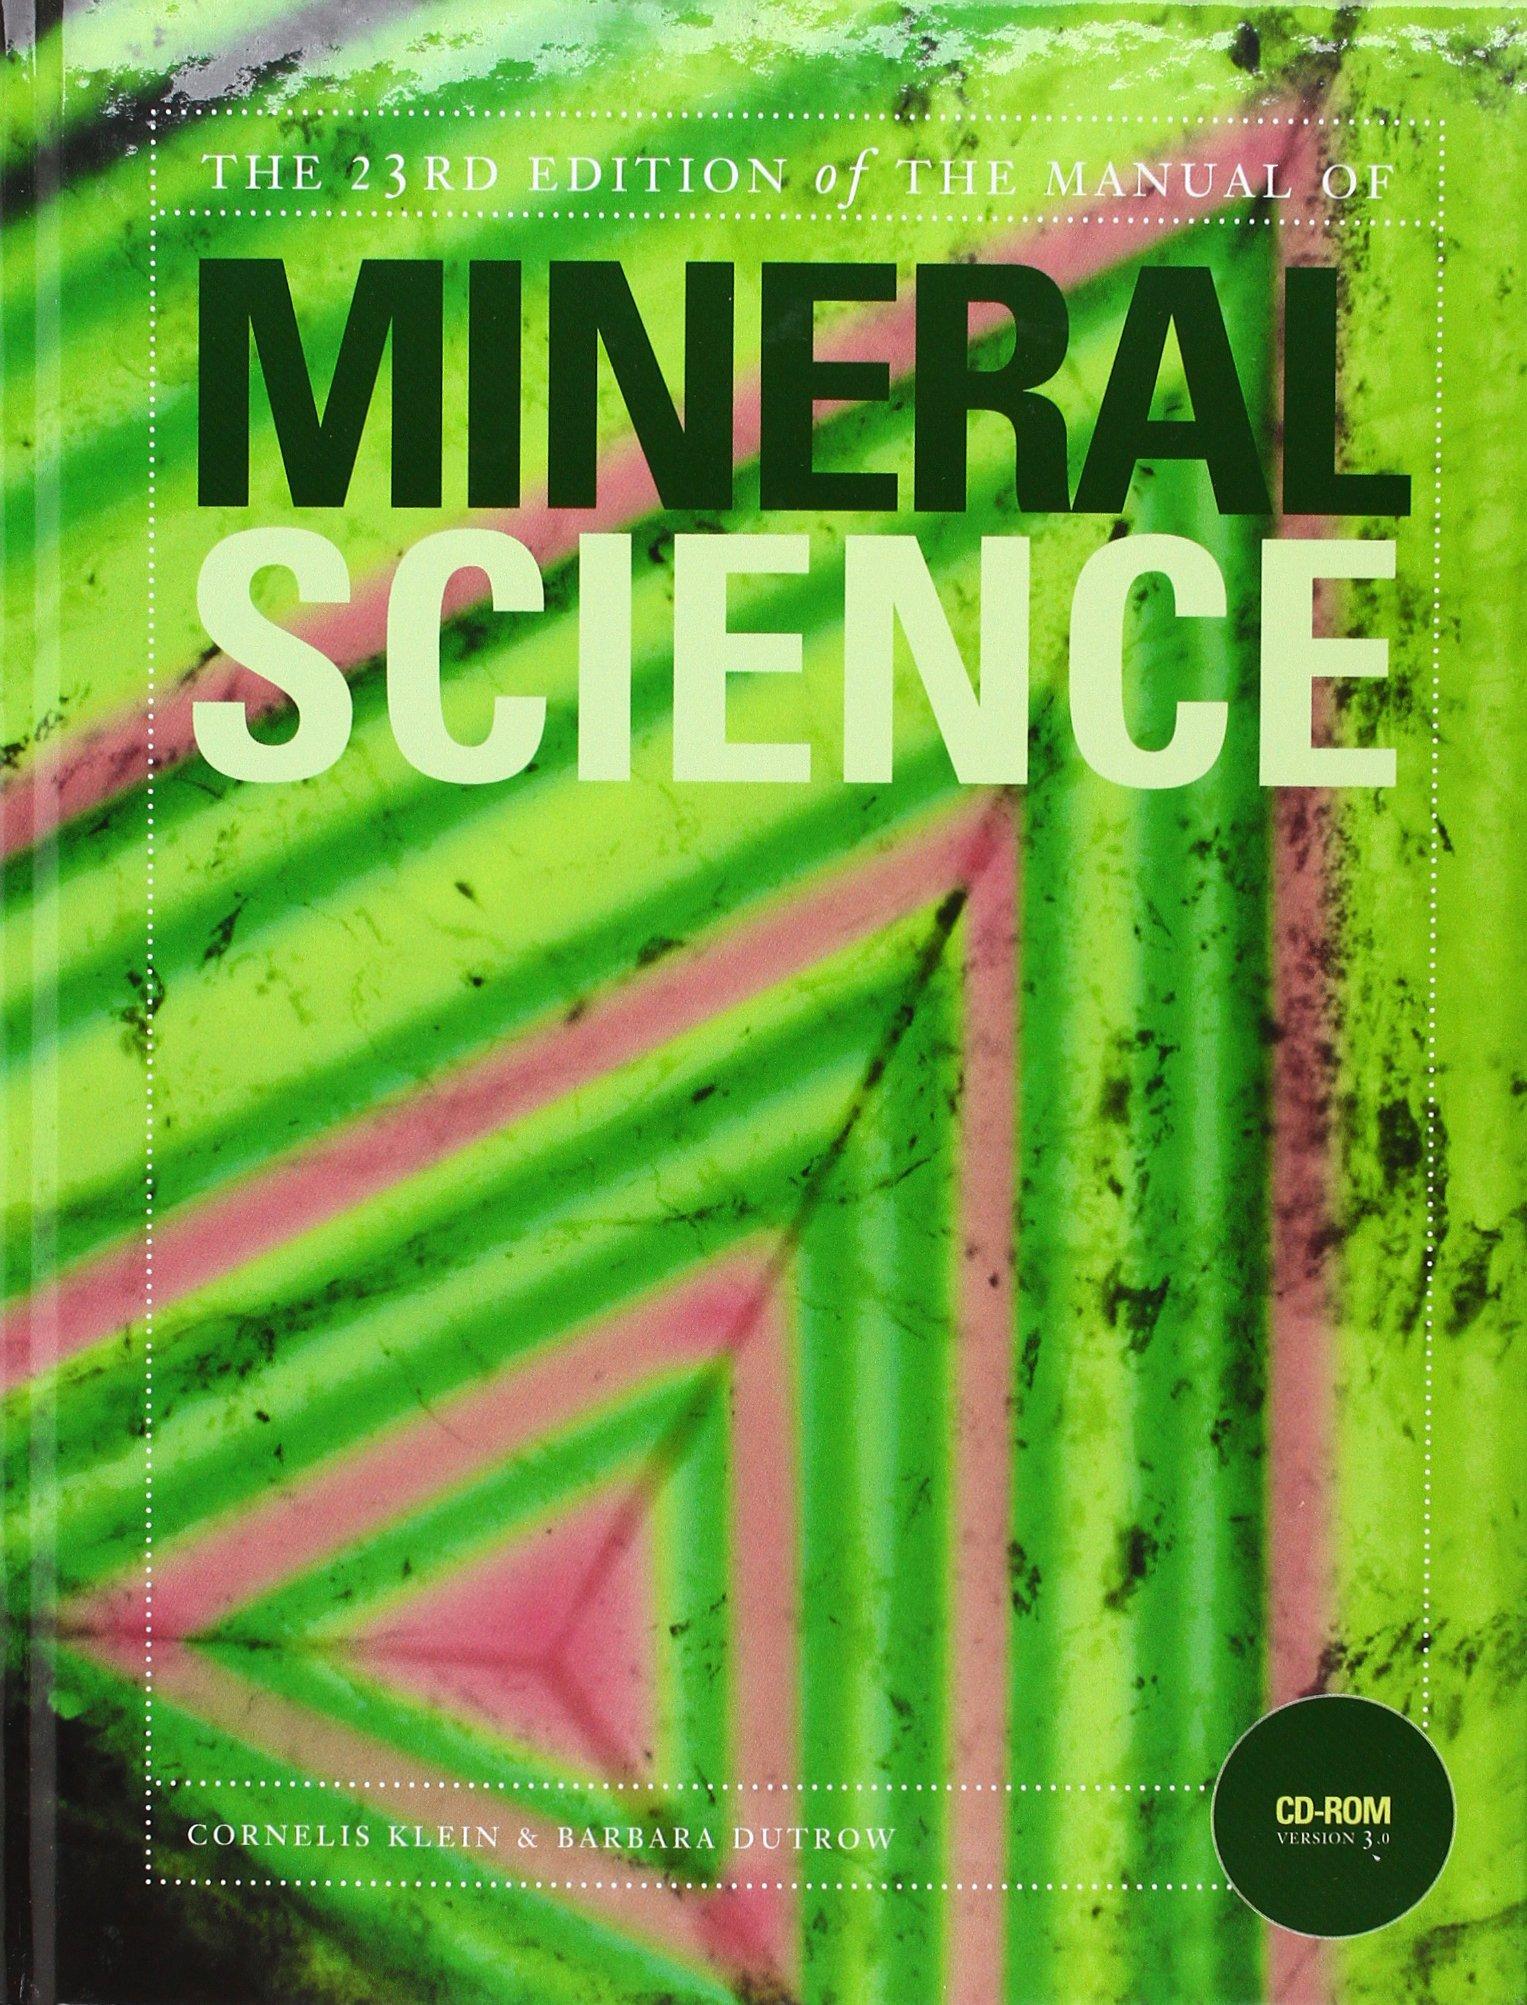 Manual of Mineral Science: Amazon.co.uk: Cornelis Klein: 9780470226018:  Books